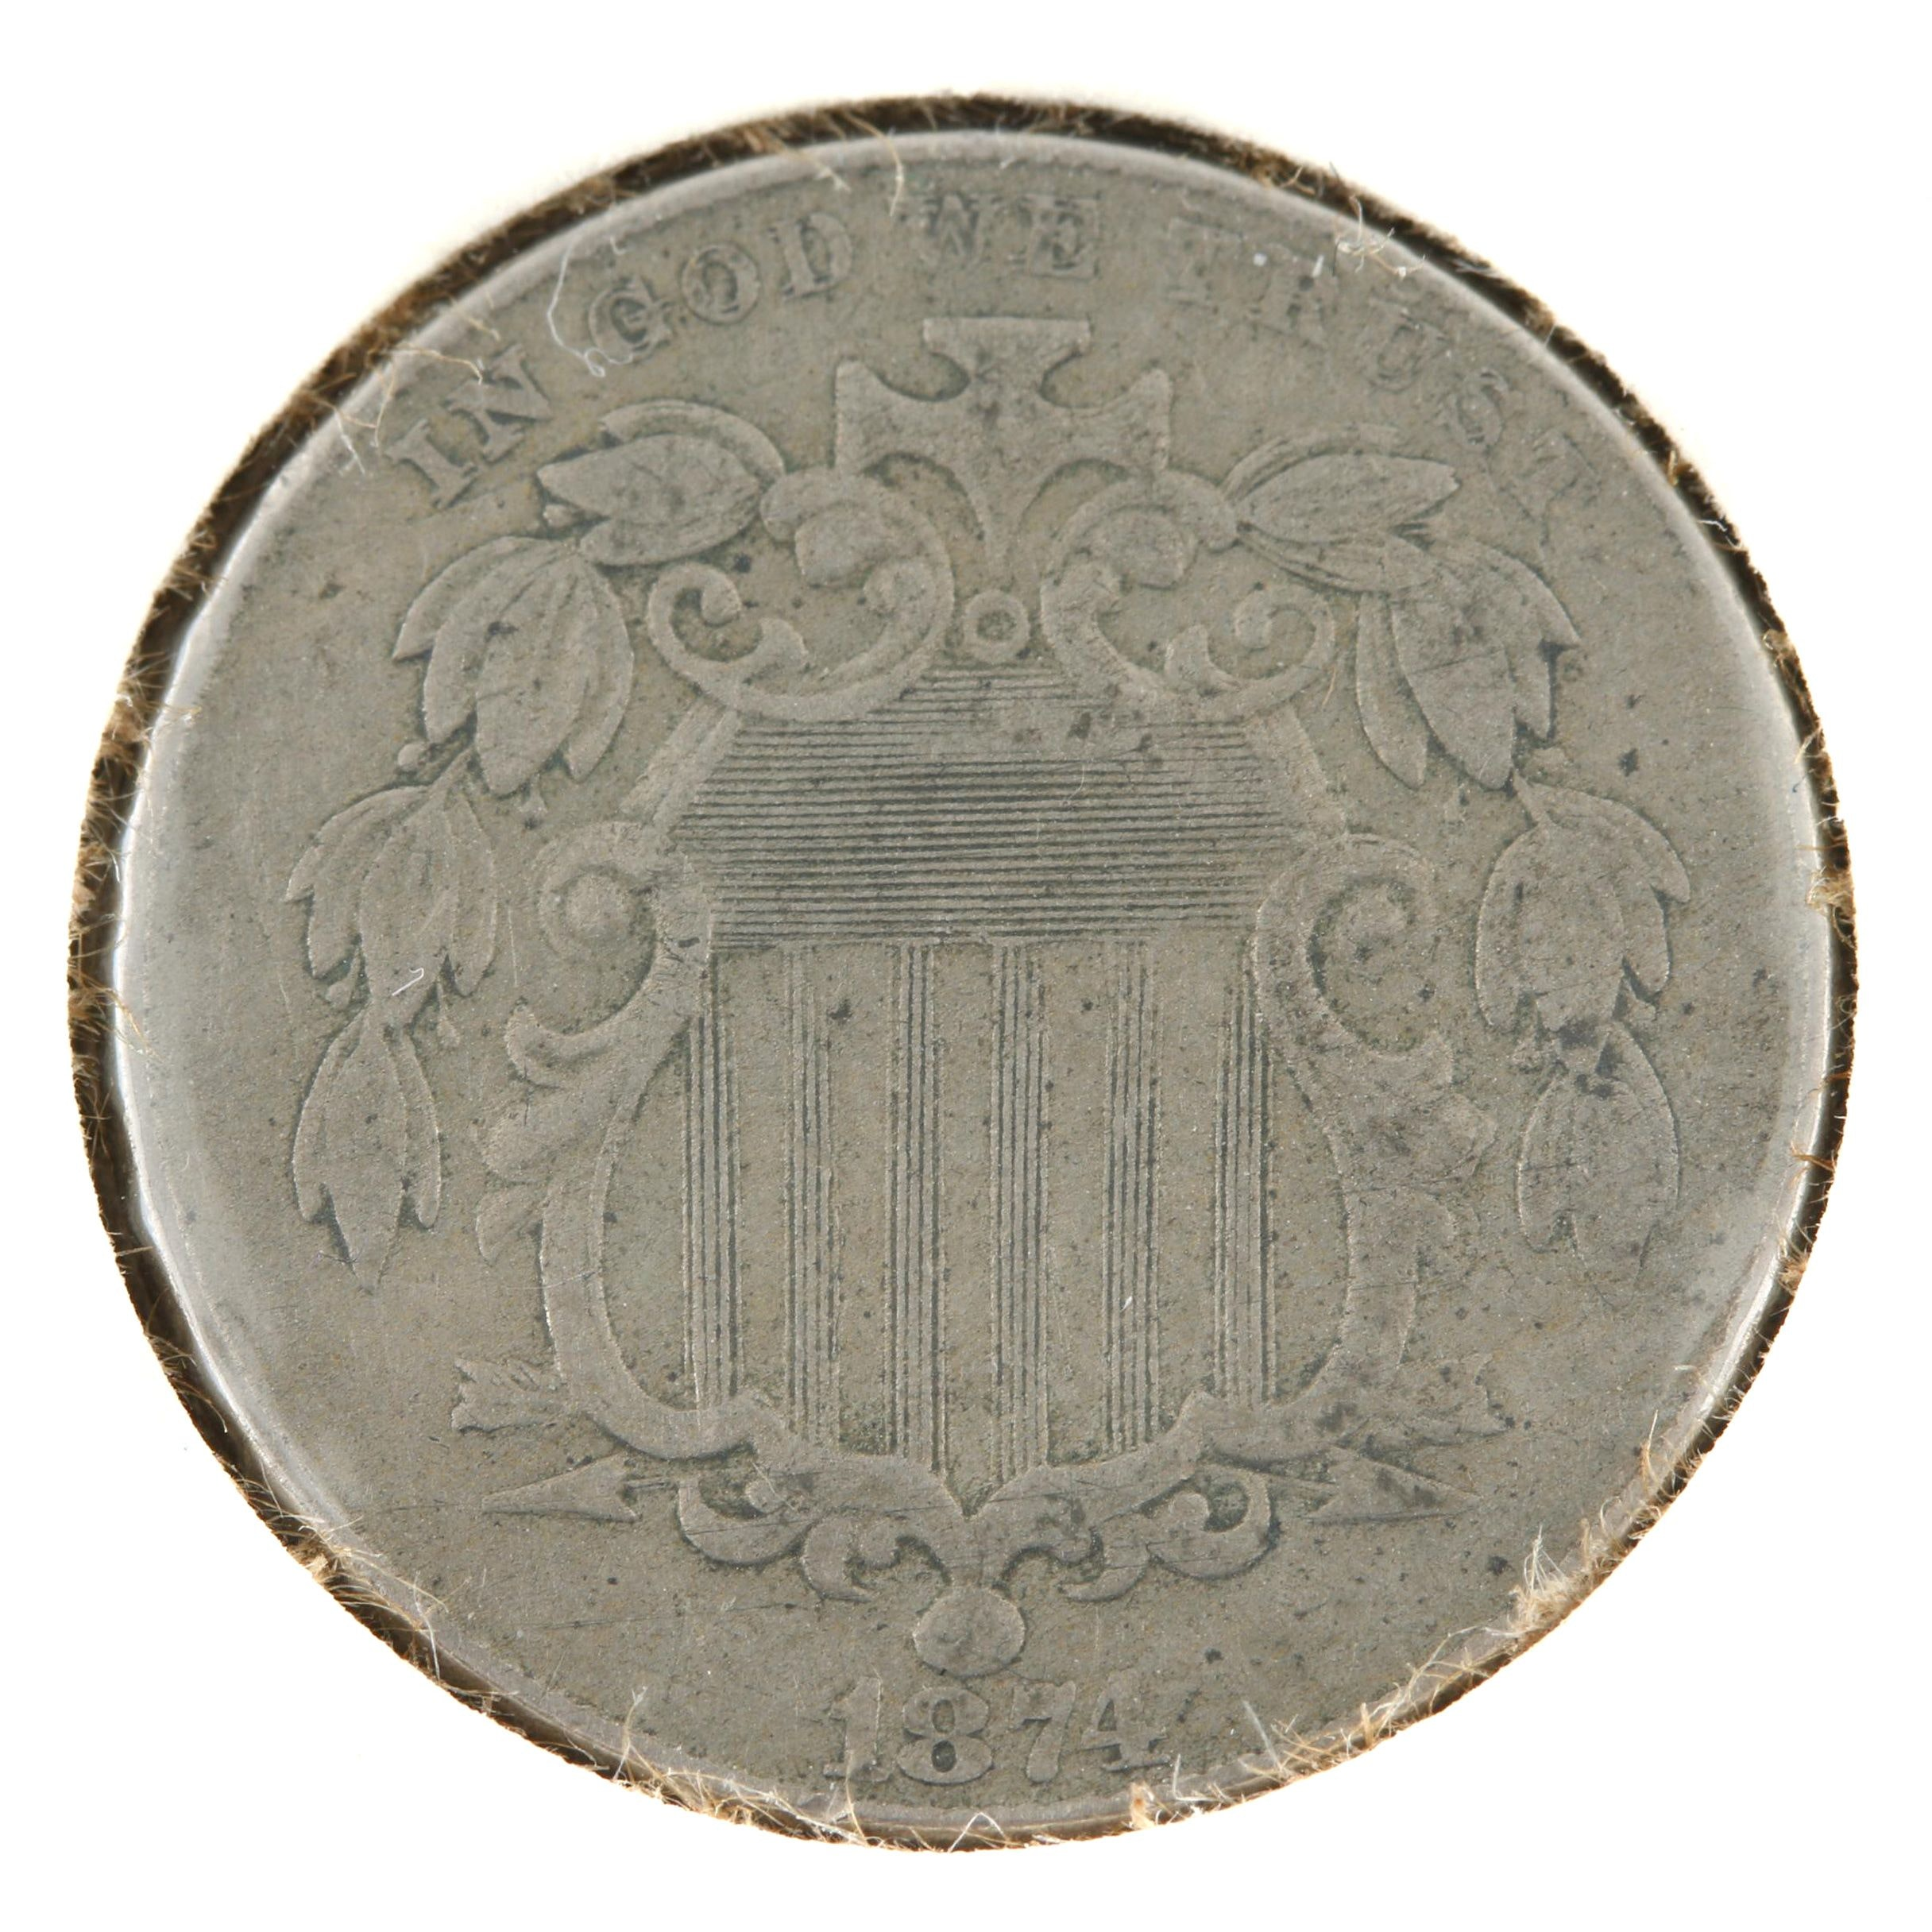 1874 Shield Nickel